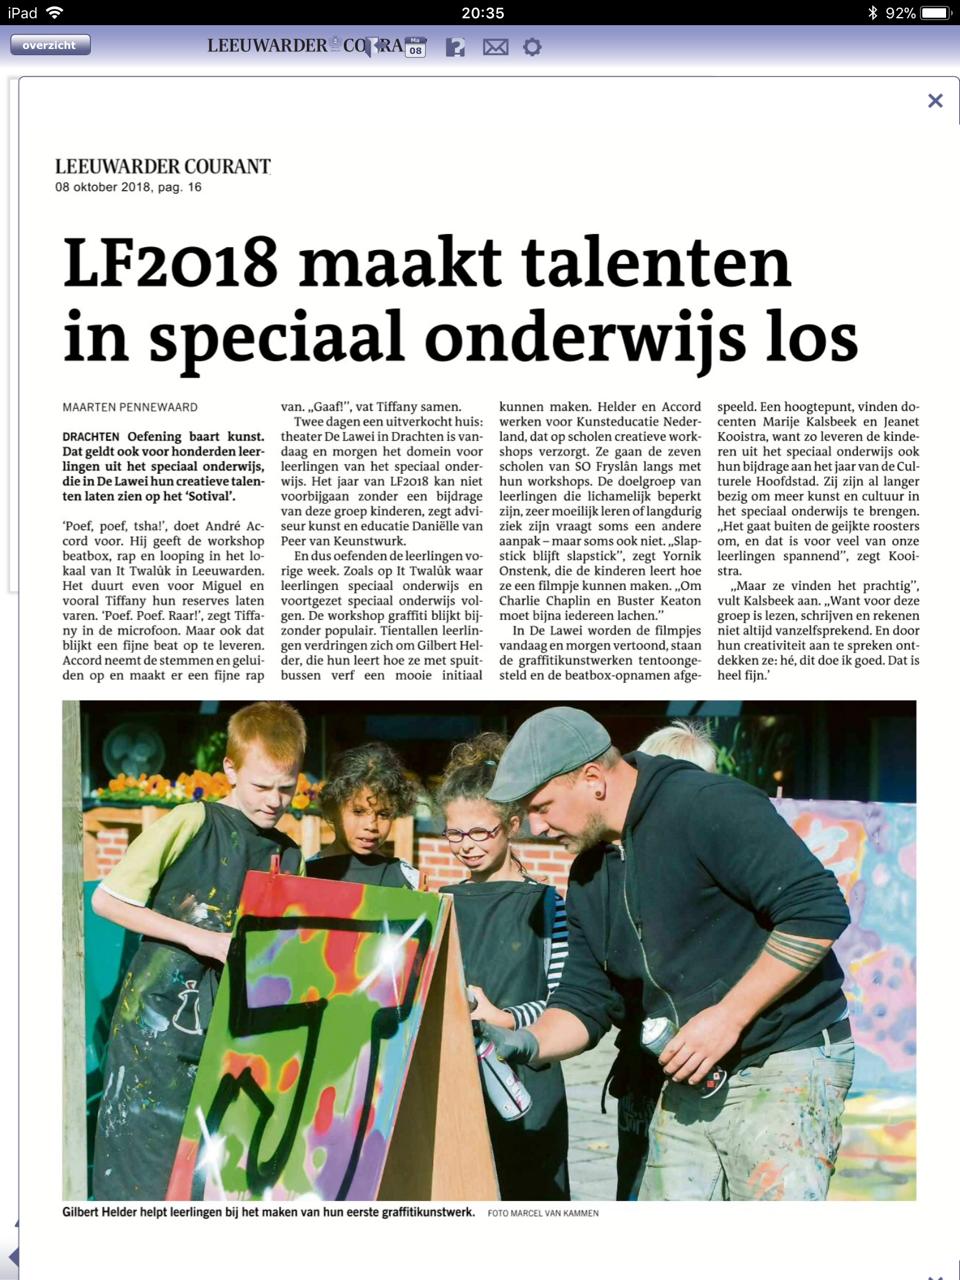 Artikel Leeuwarder Courant SOTIVAL